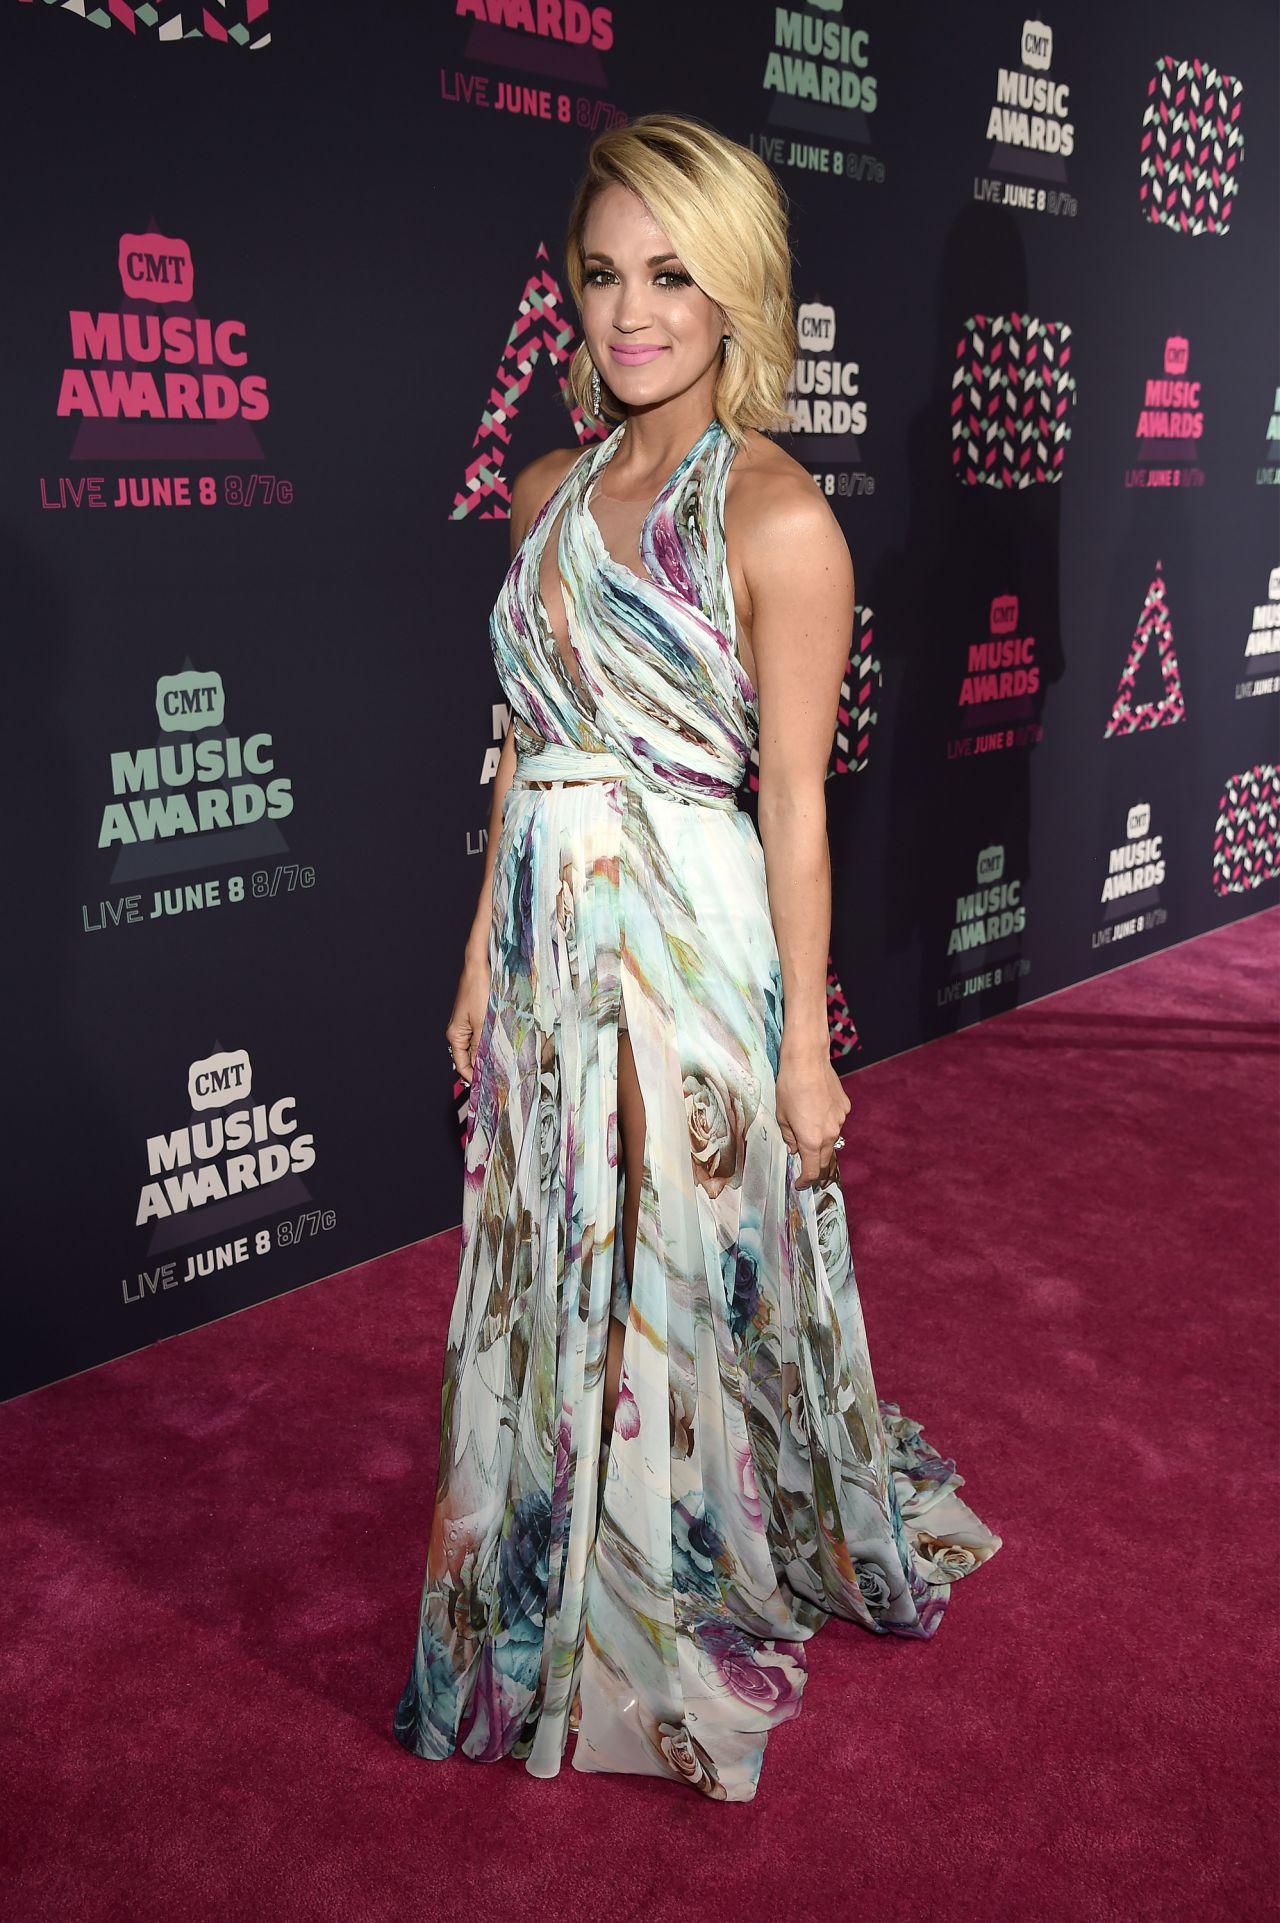 Carrie Underwood 2016 Cmt Music Awards In Nashville